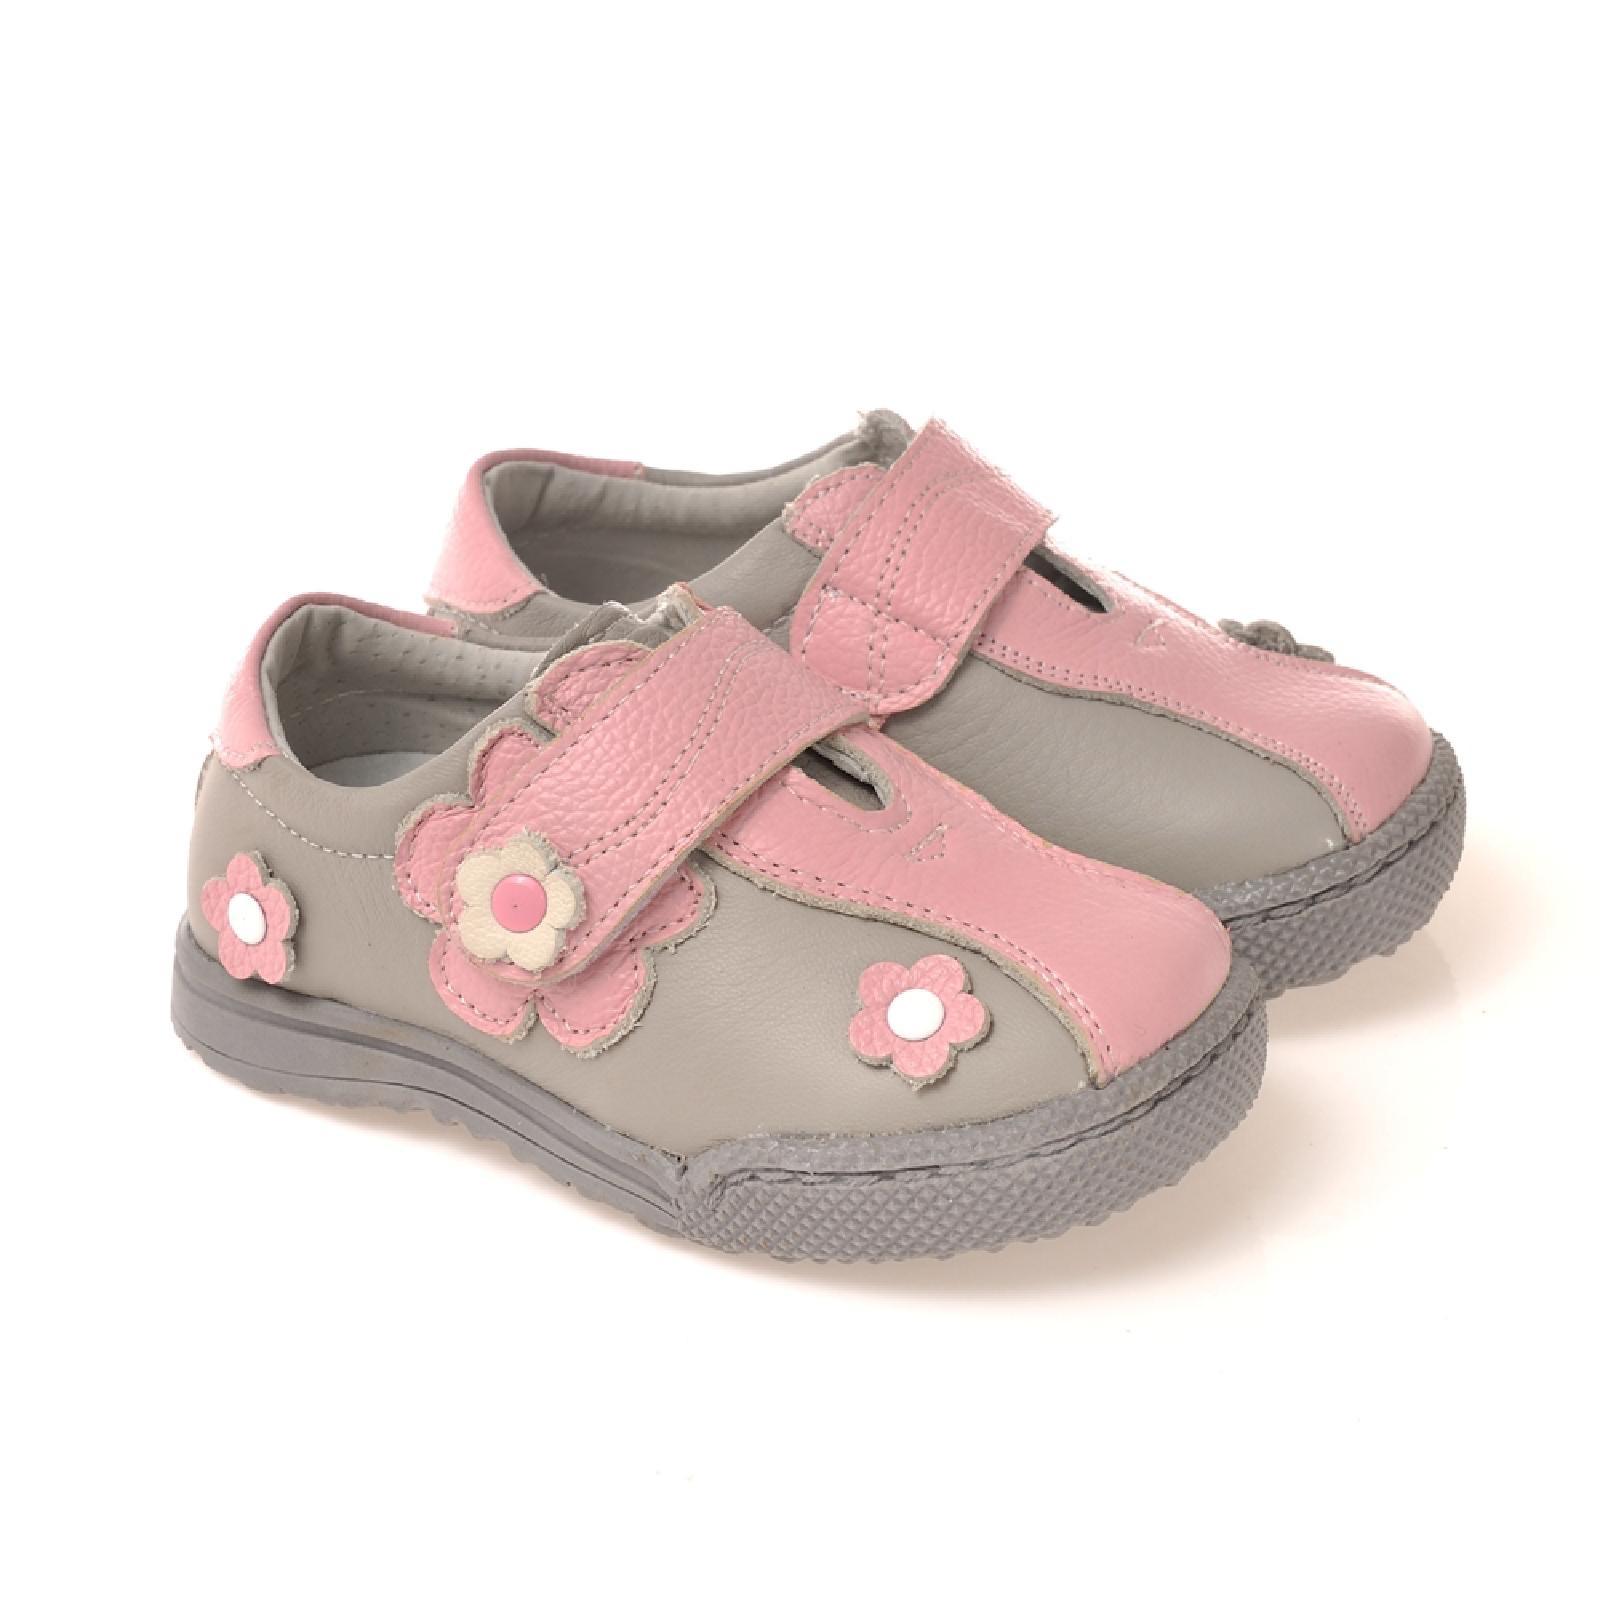 Indexbild 10 - Caroch Mädchen Sneaker Kinderschuhe Halbschuhe aus Leder